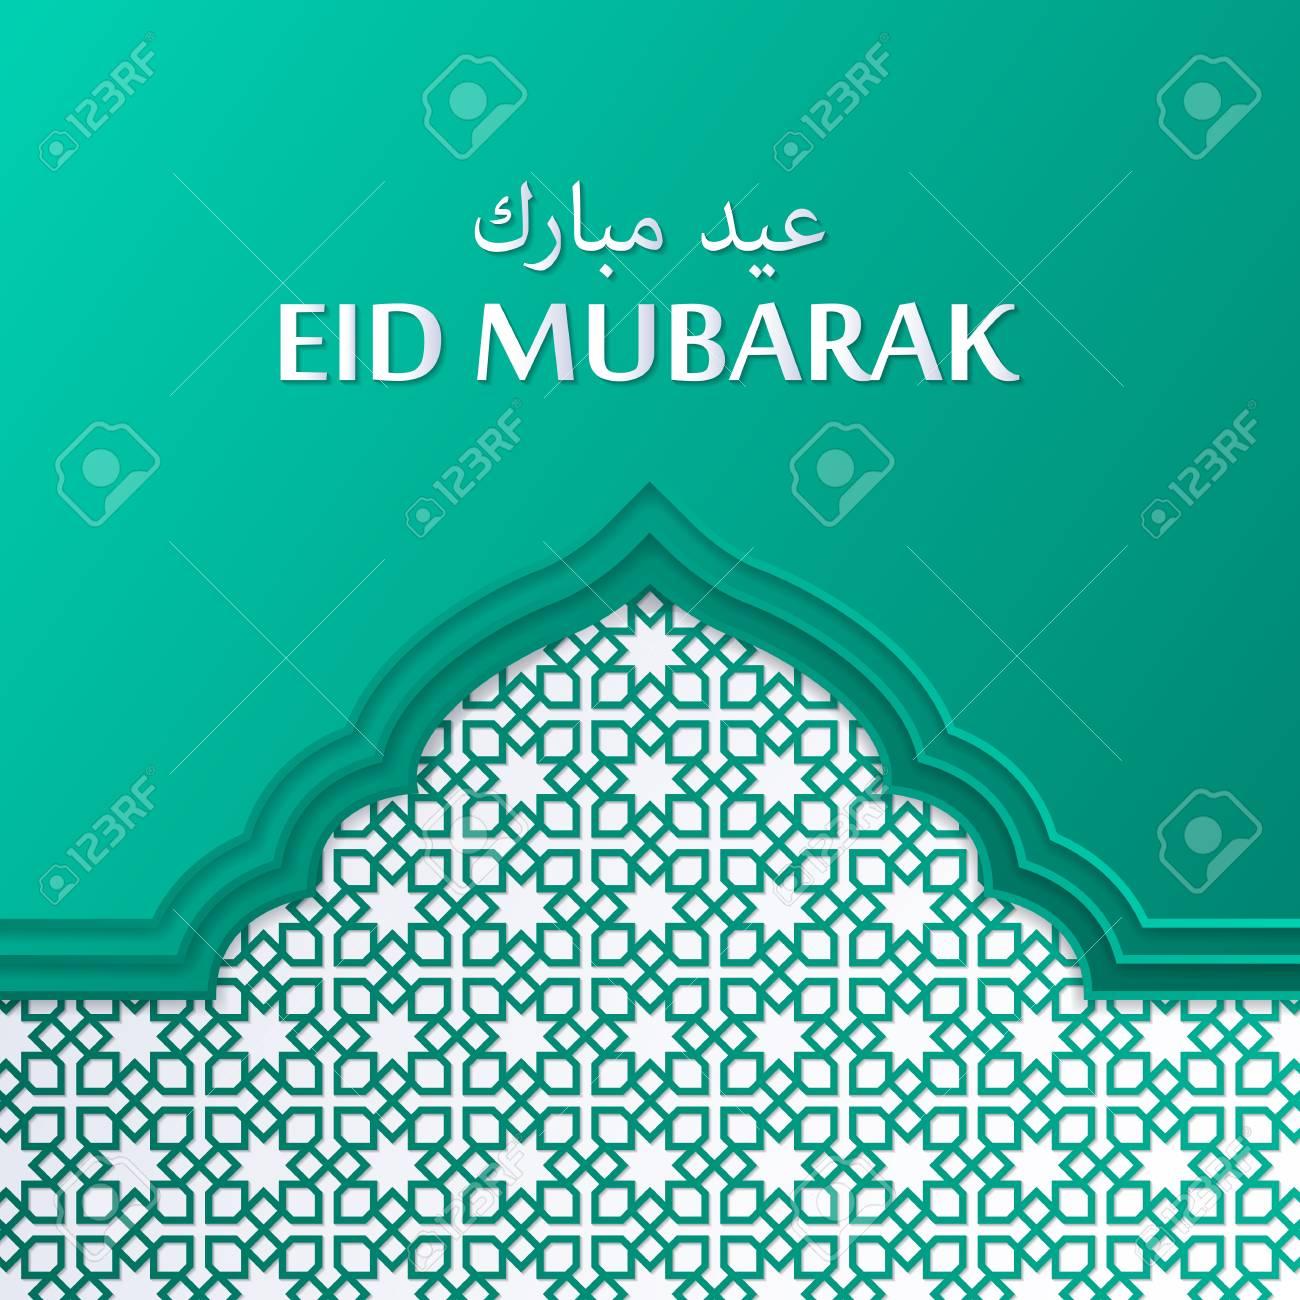 Eid mubarak ornament mosque islamic greeting card template ramadan eid mubarak ornament mosque islamic greeting card template ramadan kareem background pattern stock vector 101085166 m4hsunfo